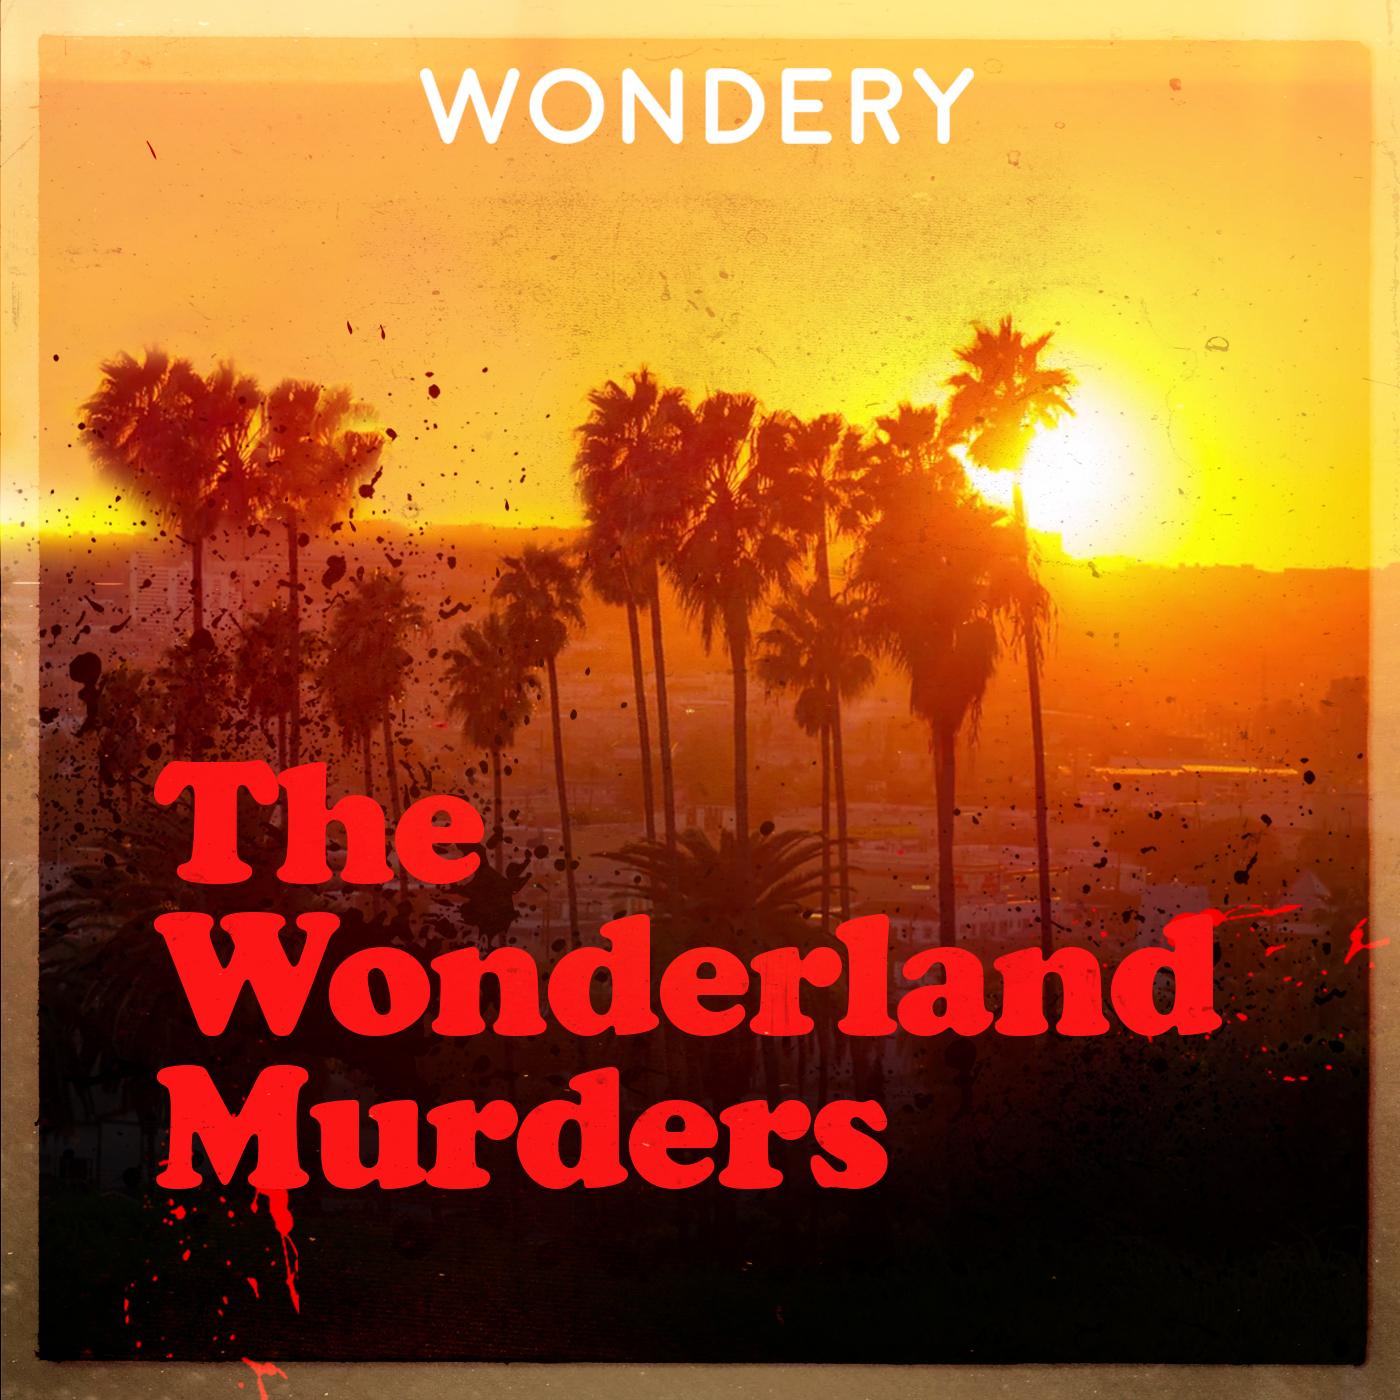 Introducing The Wonderland Murders